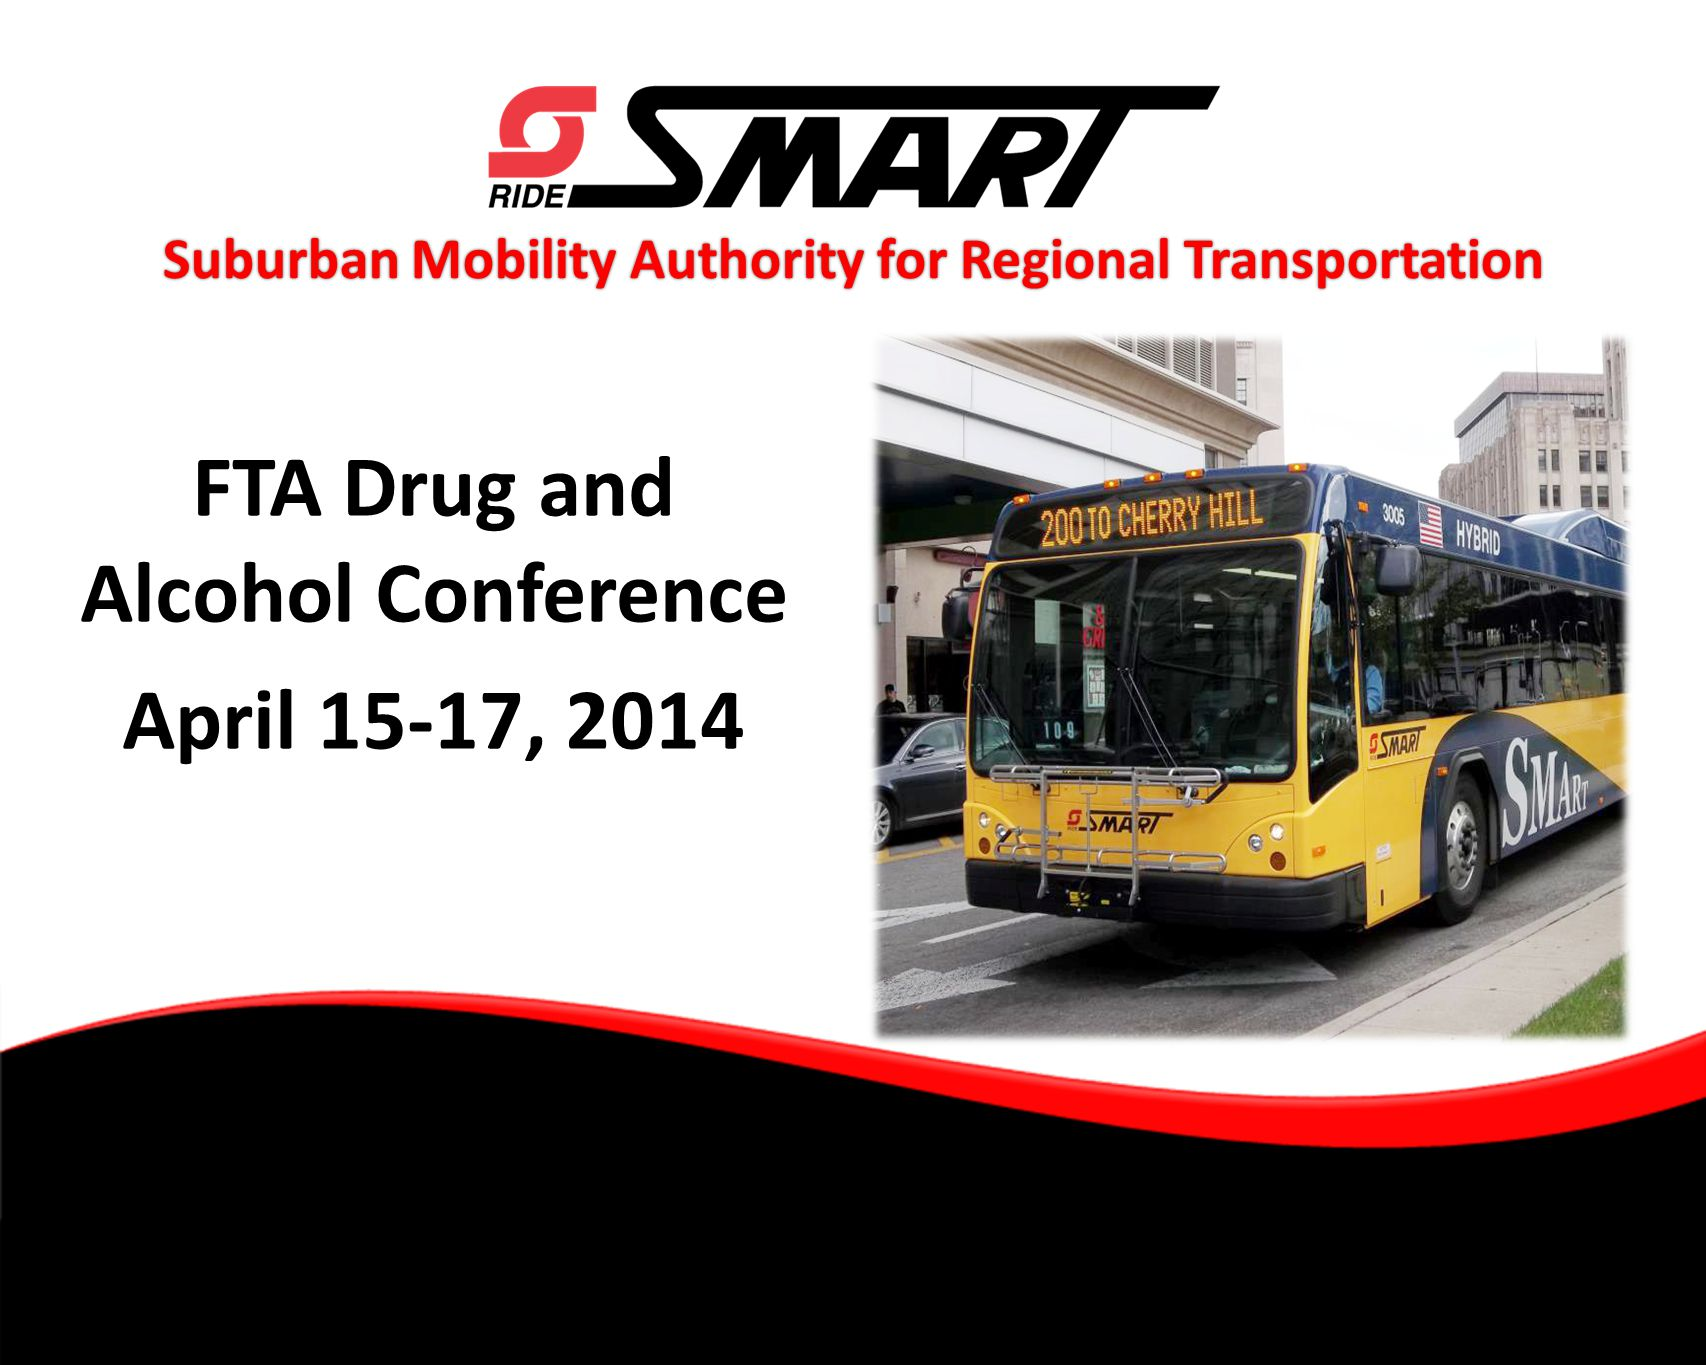 Suburban Mobility Authority for Regional Transportation